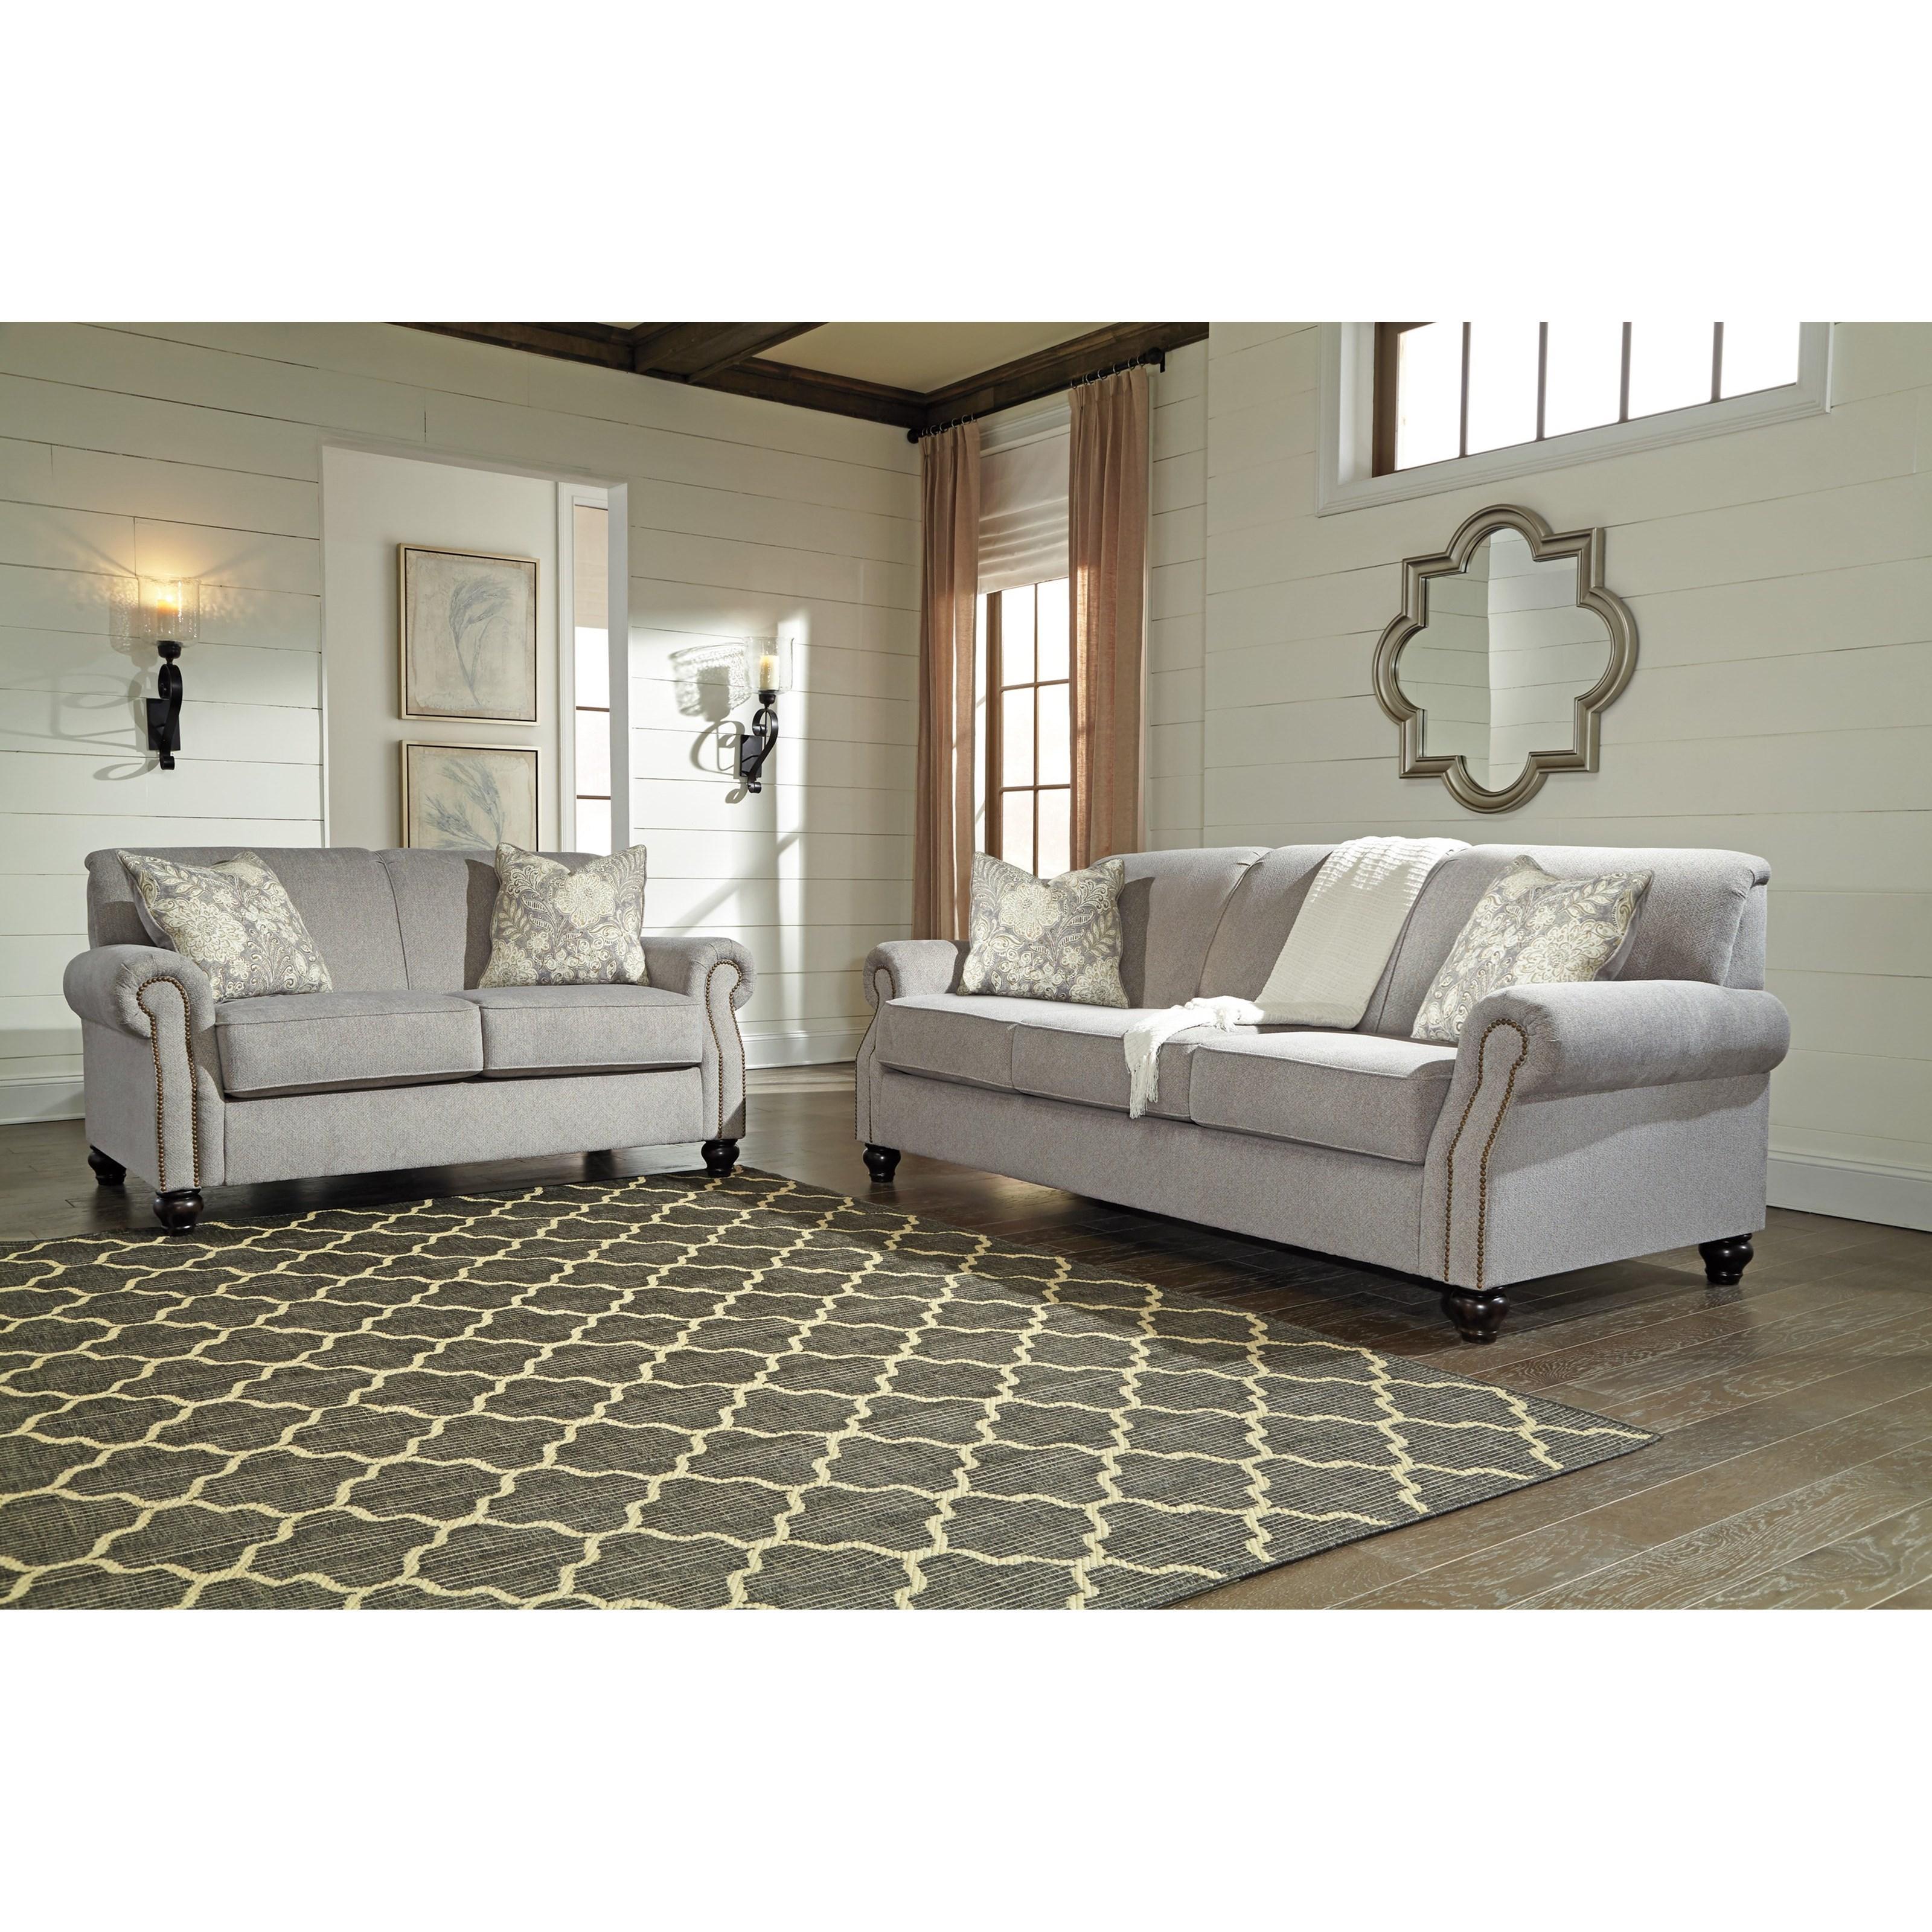 Benchcraft Avelynne Stationary Living Room Group - Item Number: 81302 Living Room Group 1